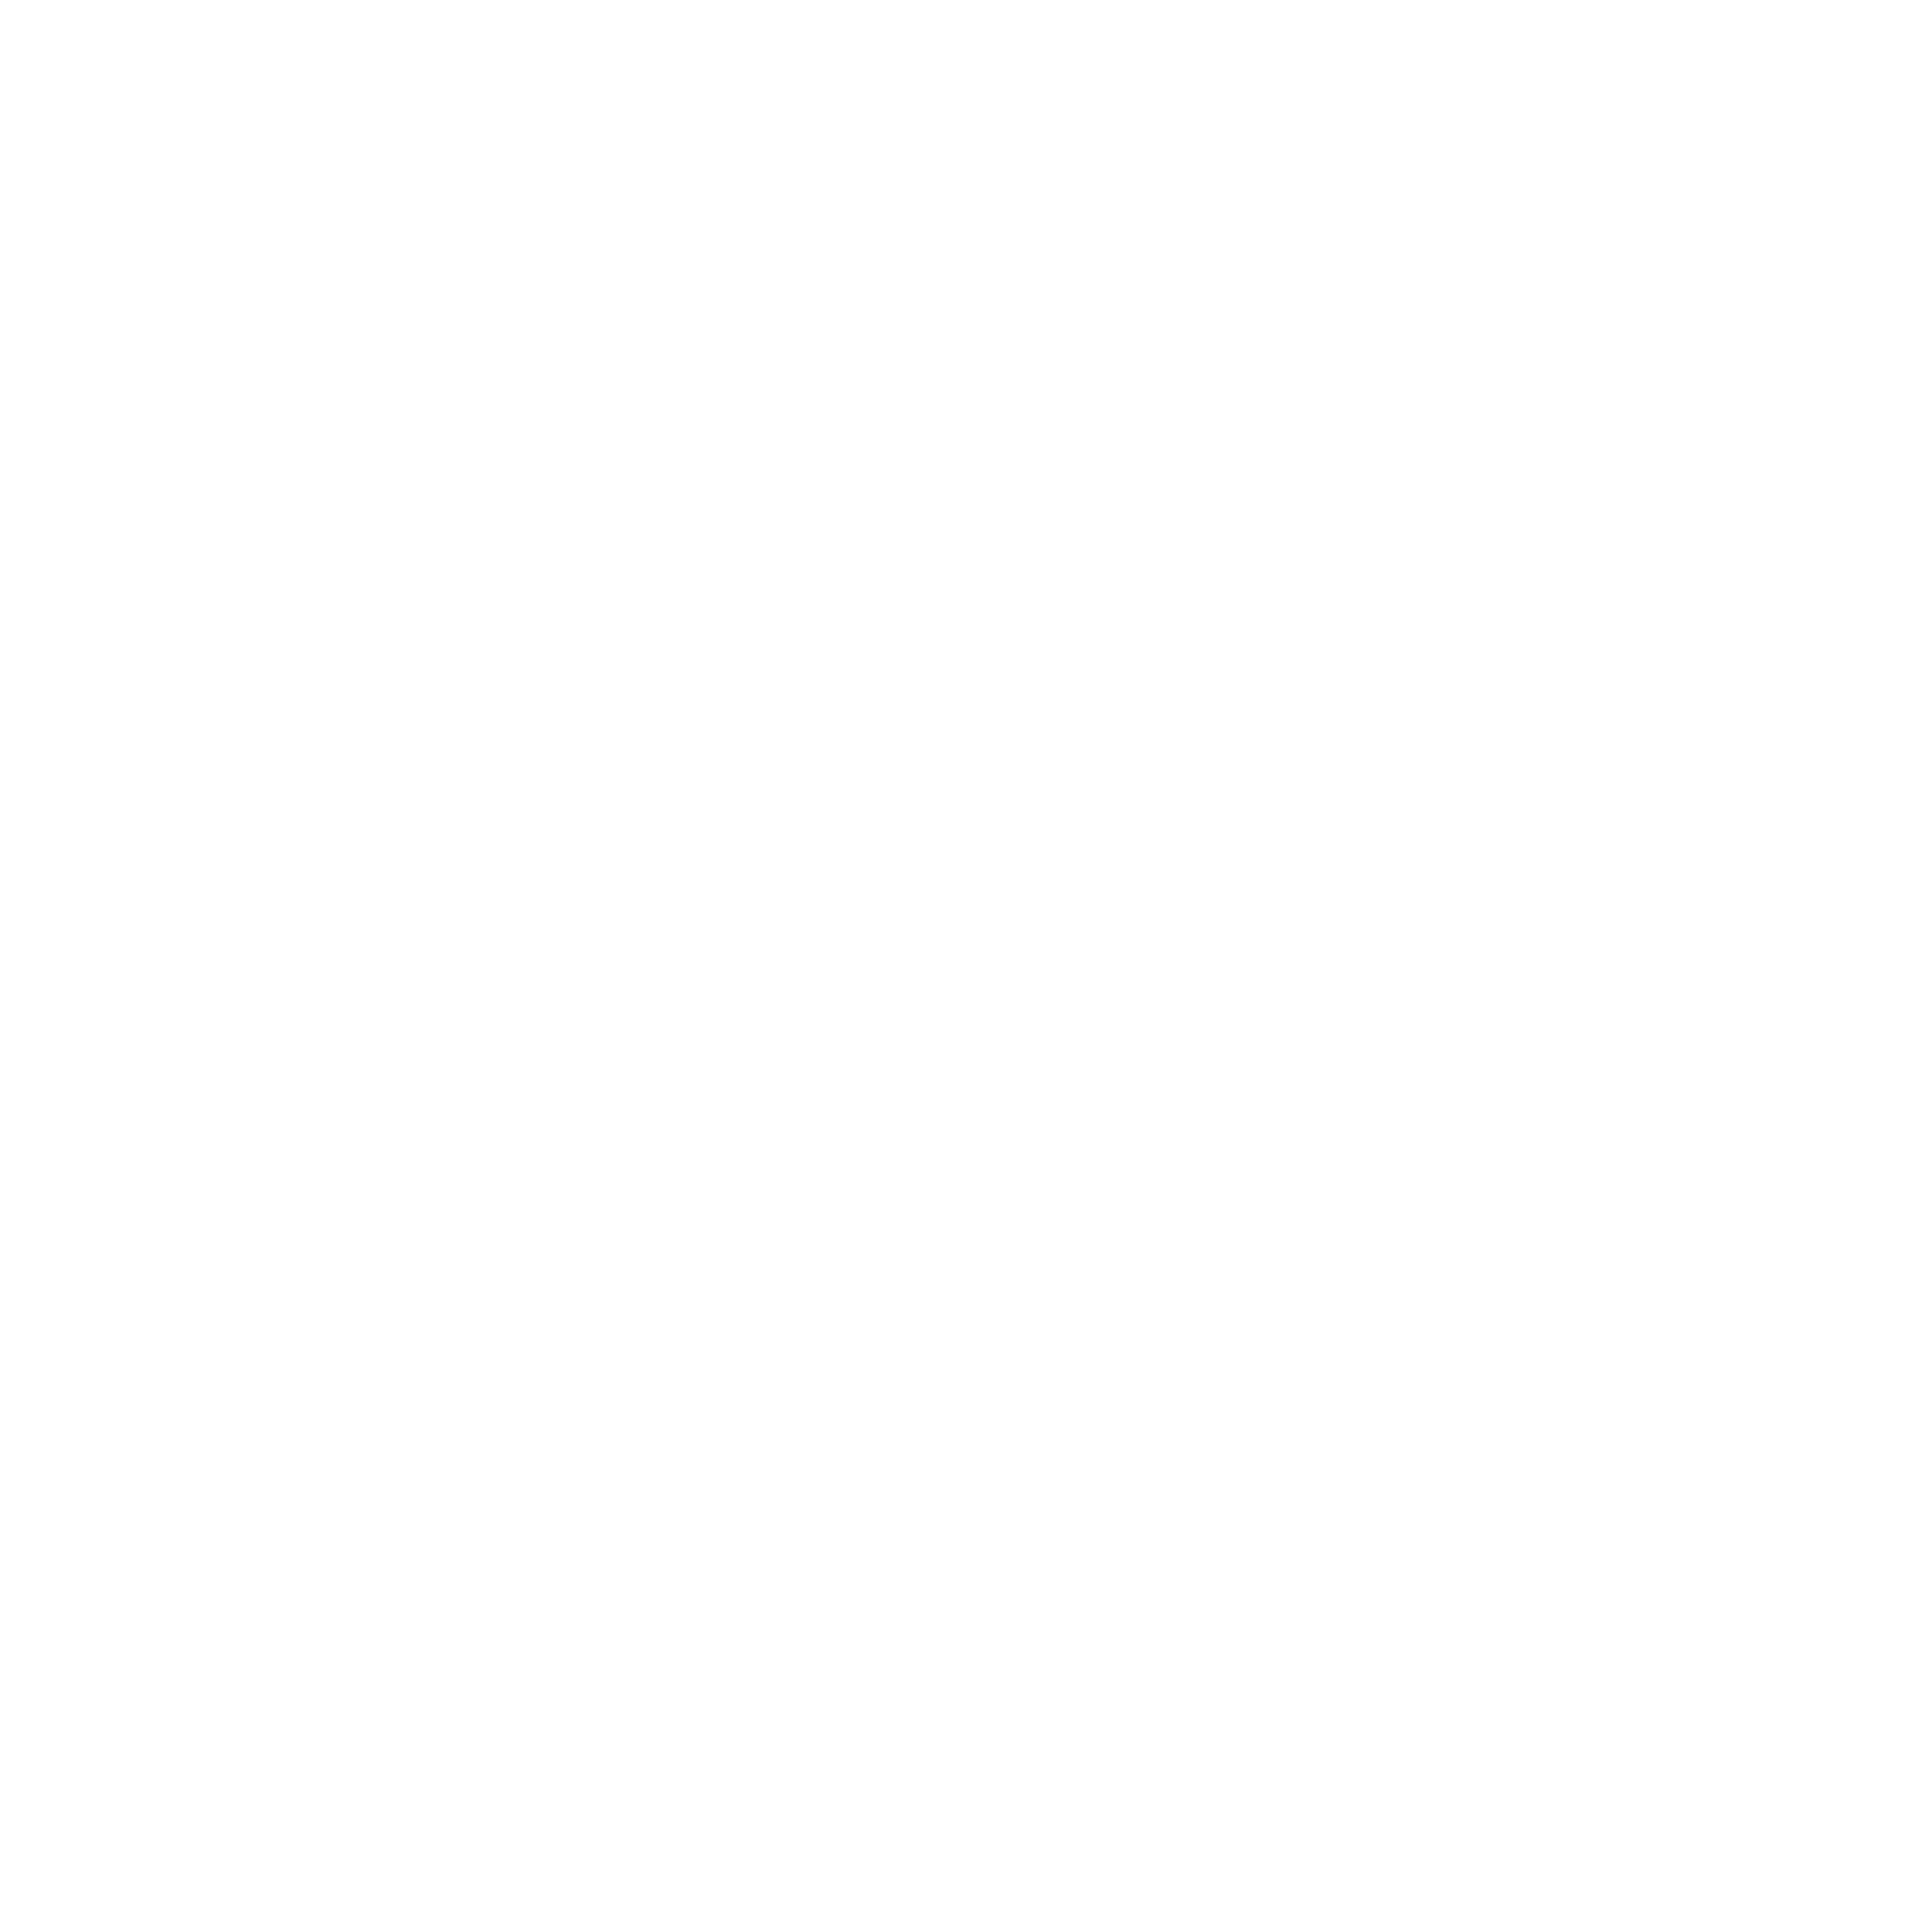 HUAWEI MatePad Full Screen